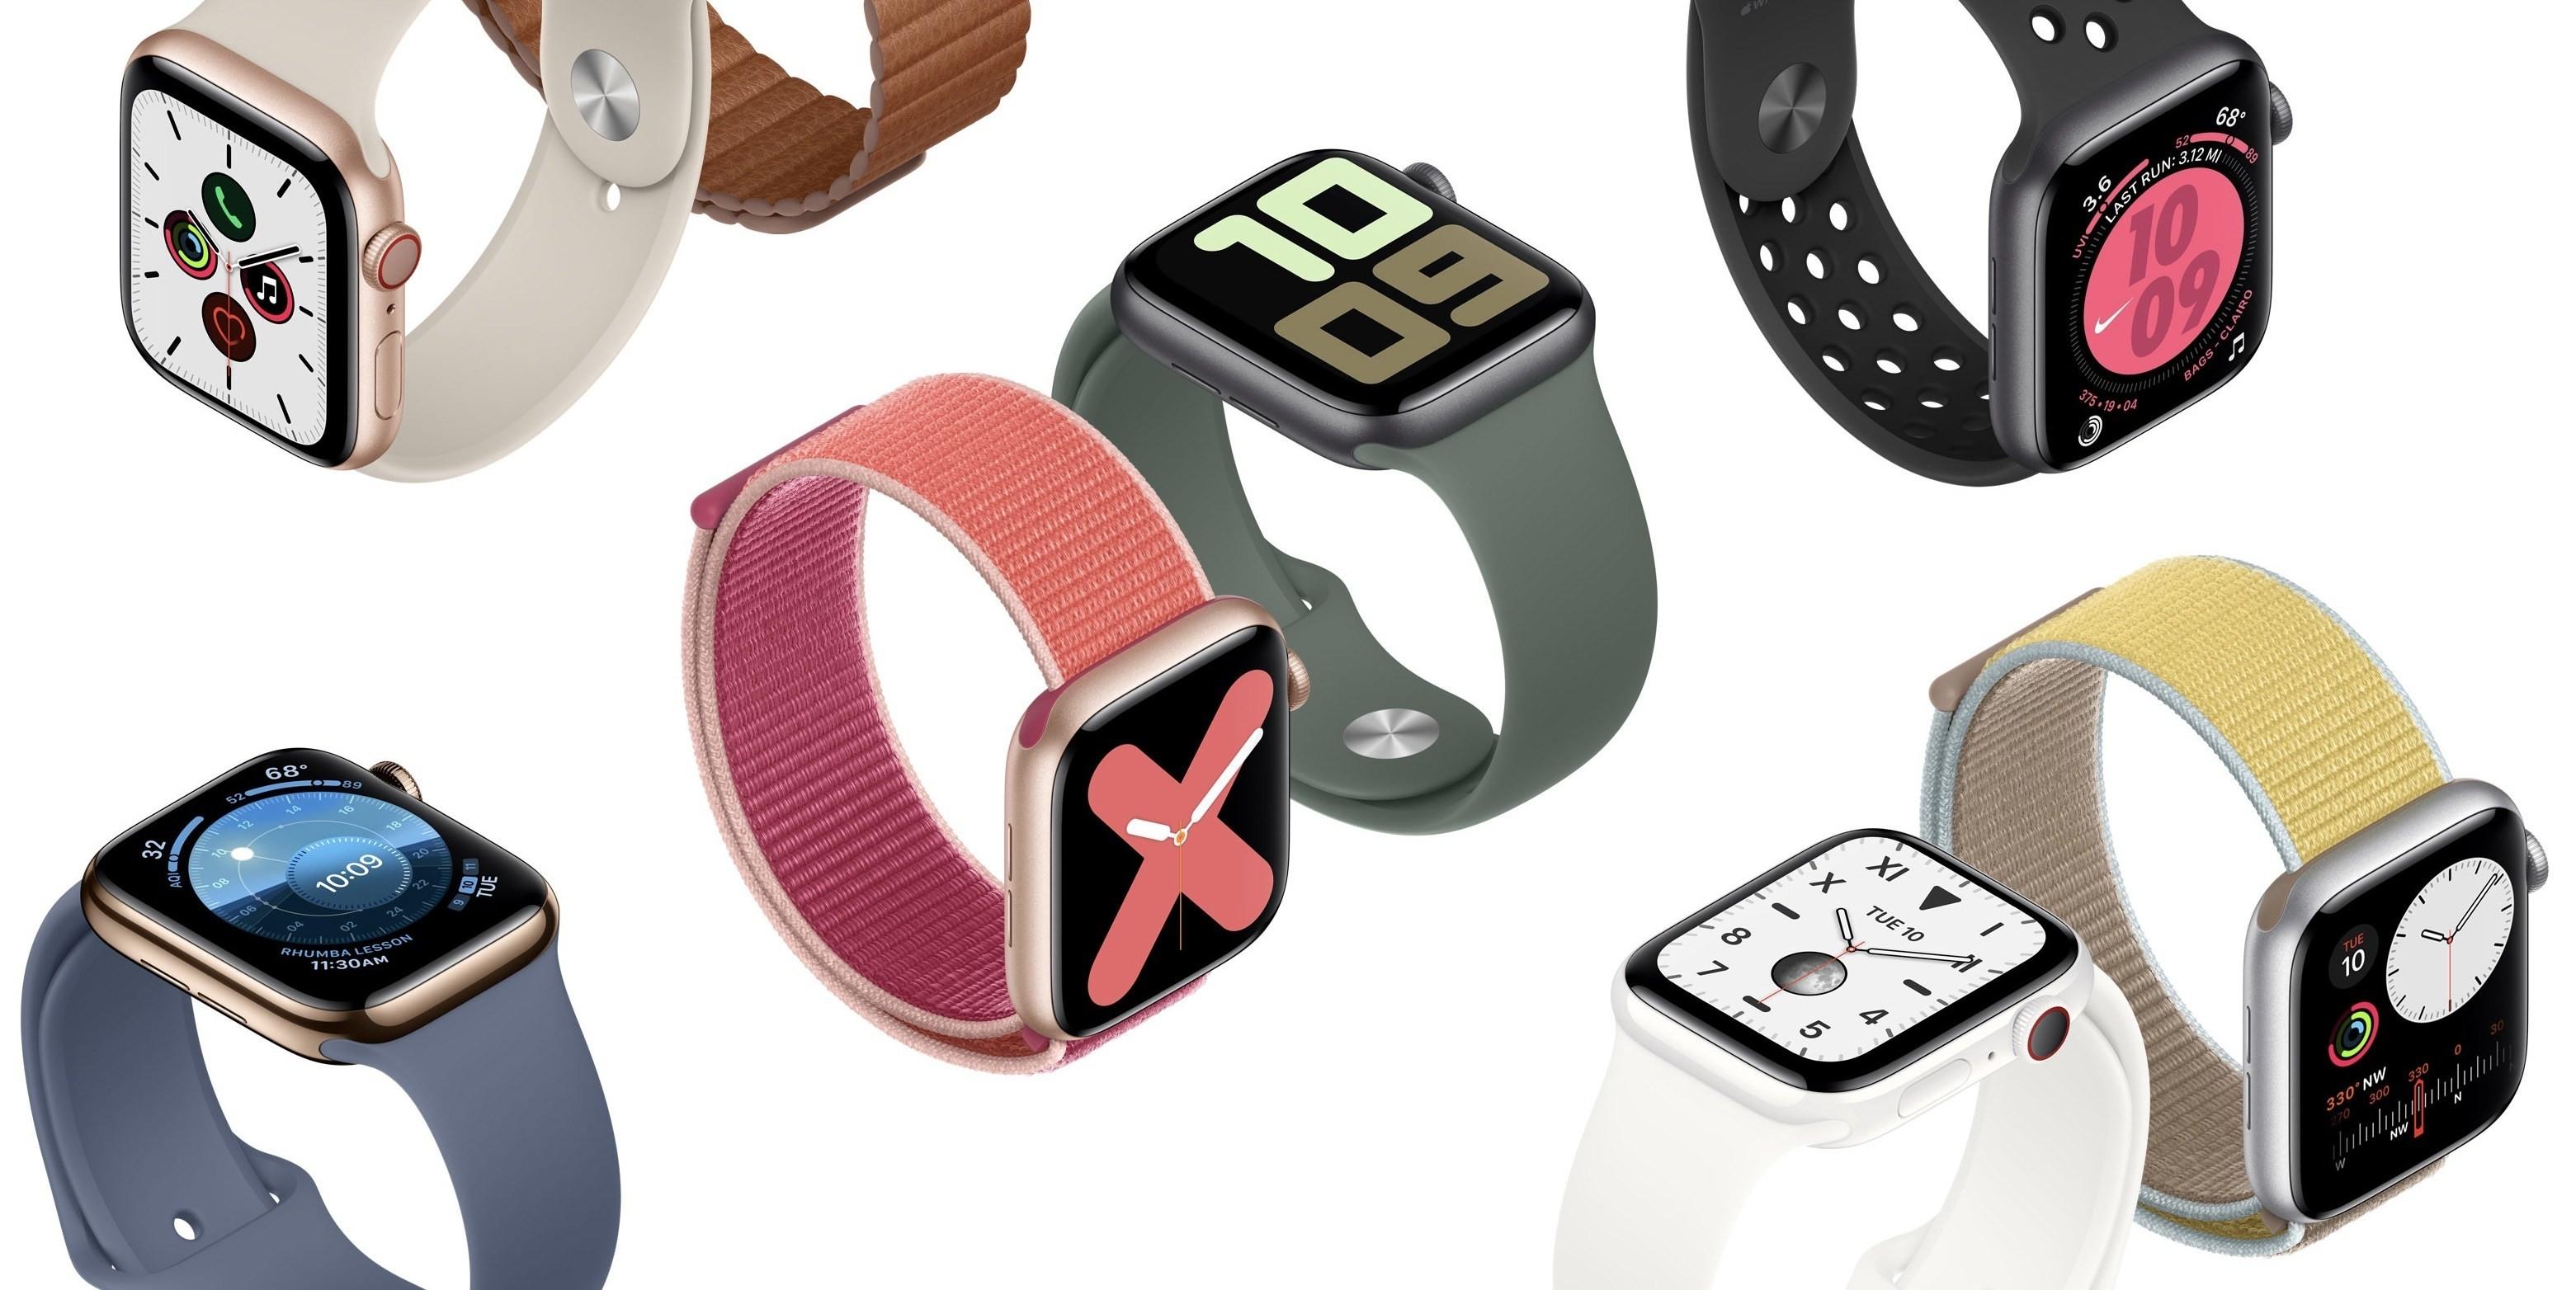 Watch, Apple Watch Series 3, Apple Watch Series 4, Apple, , Display device, Watch Band, Strap, Retina display, Wrist, watch, Fashion accessory, Wristband, Material property, Font, Watch, Bracelet, Jewellery